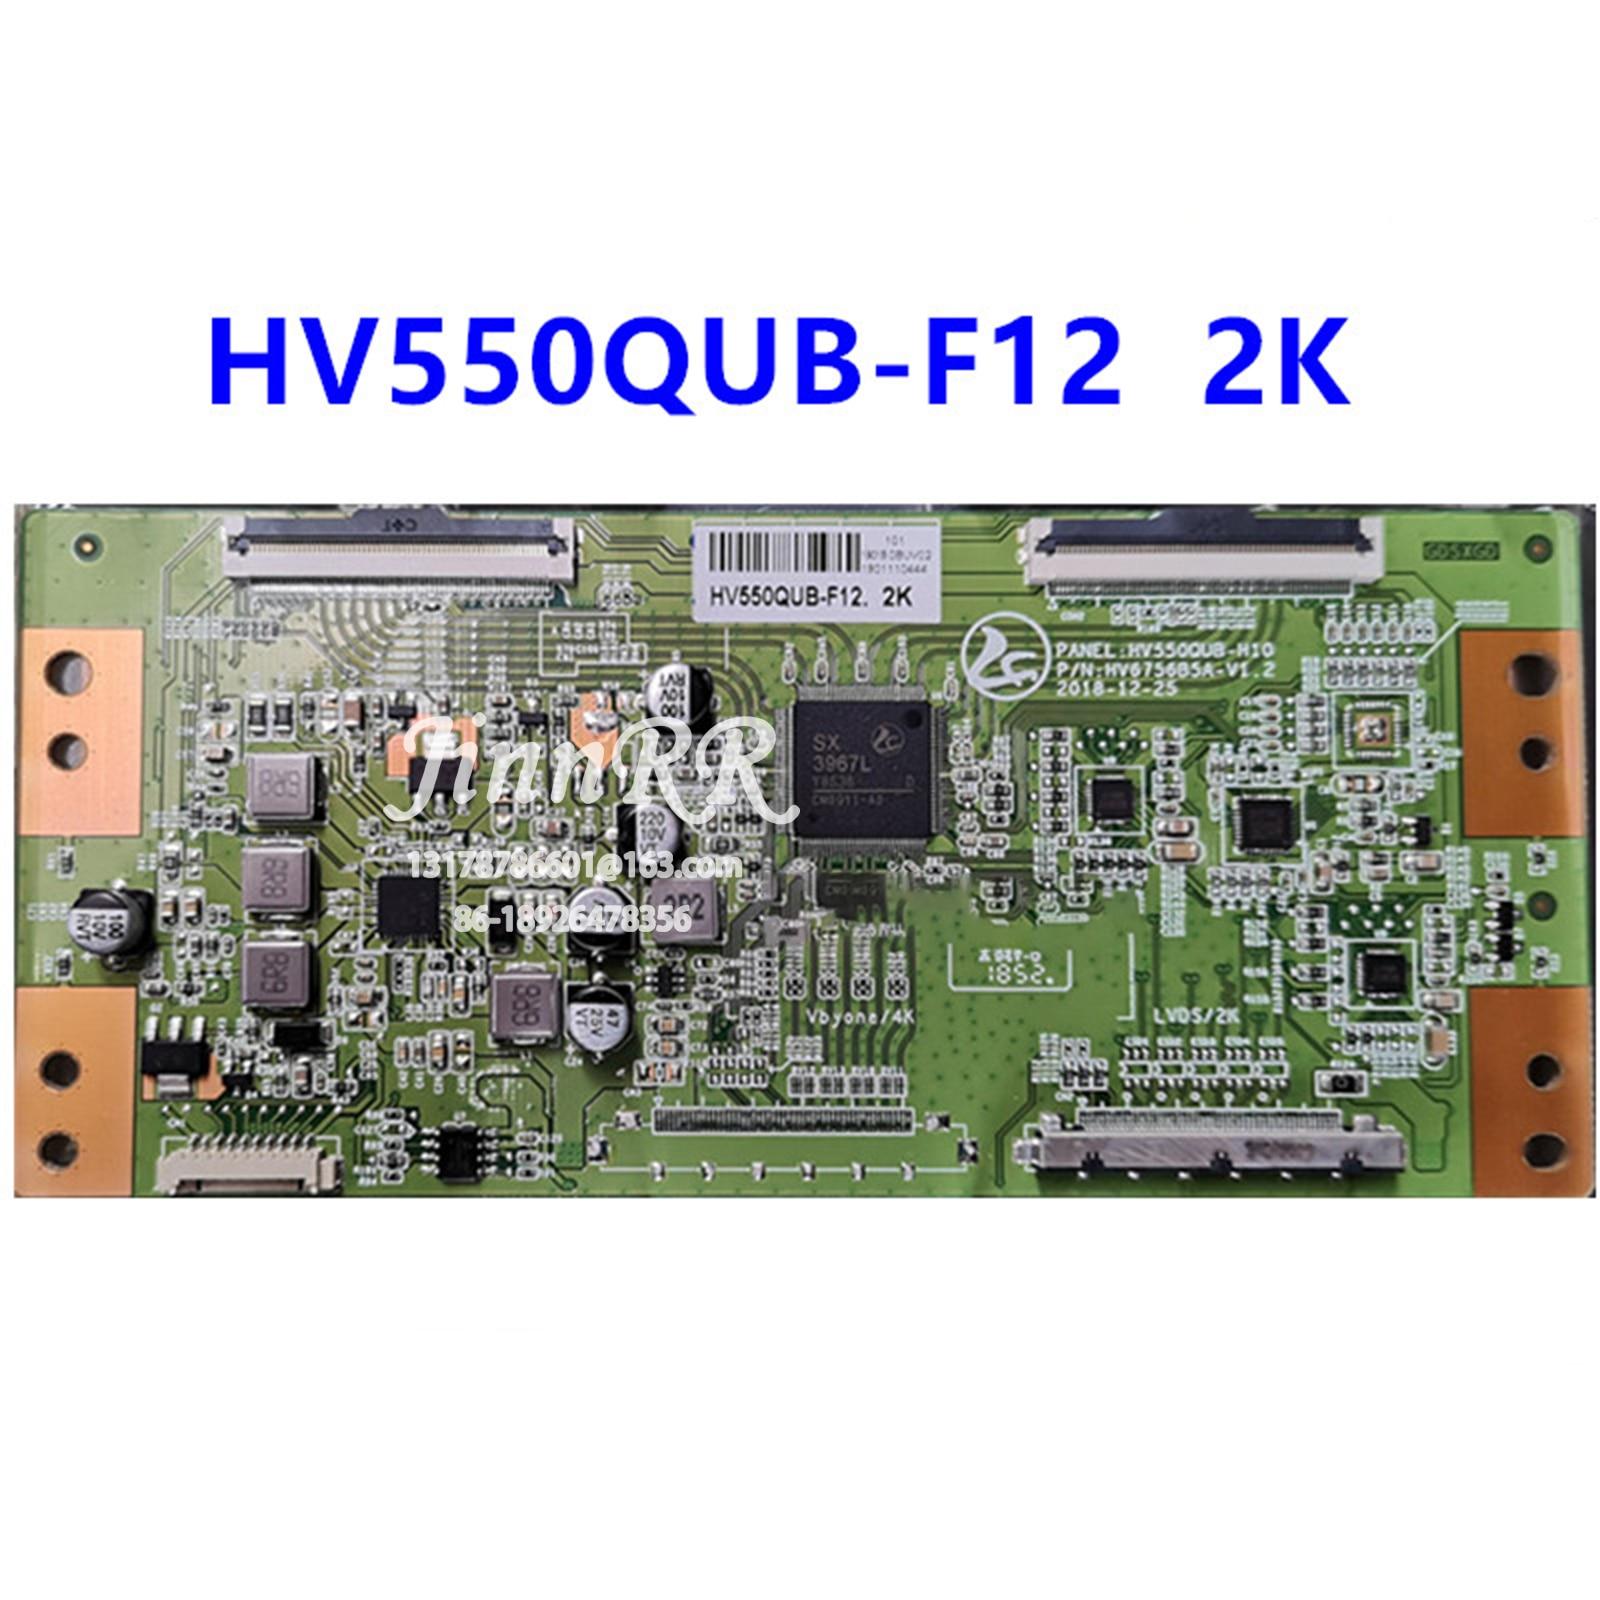 HV550QUB-F12 2K ترقية جديدة ل HV550QUB-F12 2K مجلس المنطق اختبار صارم ضمان الجودة